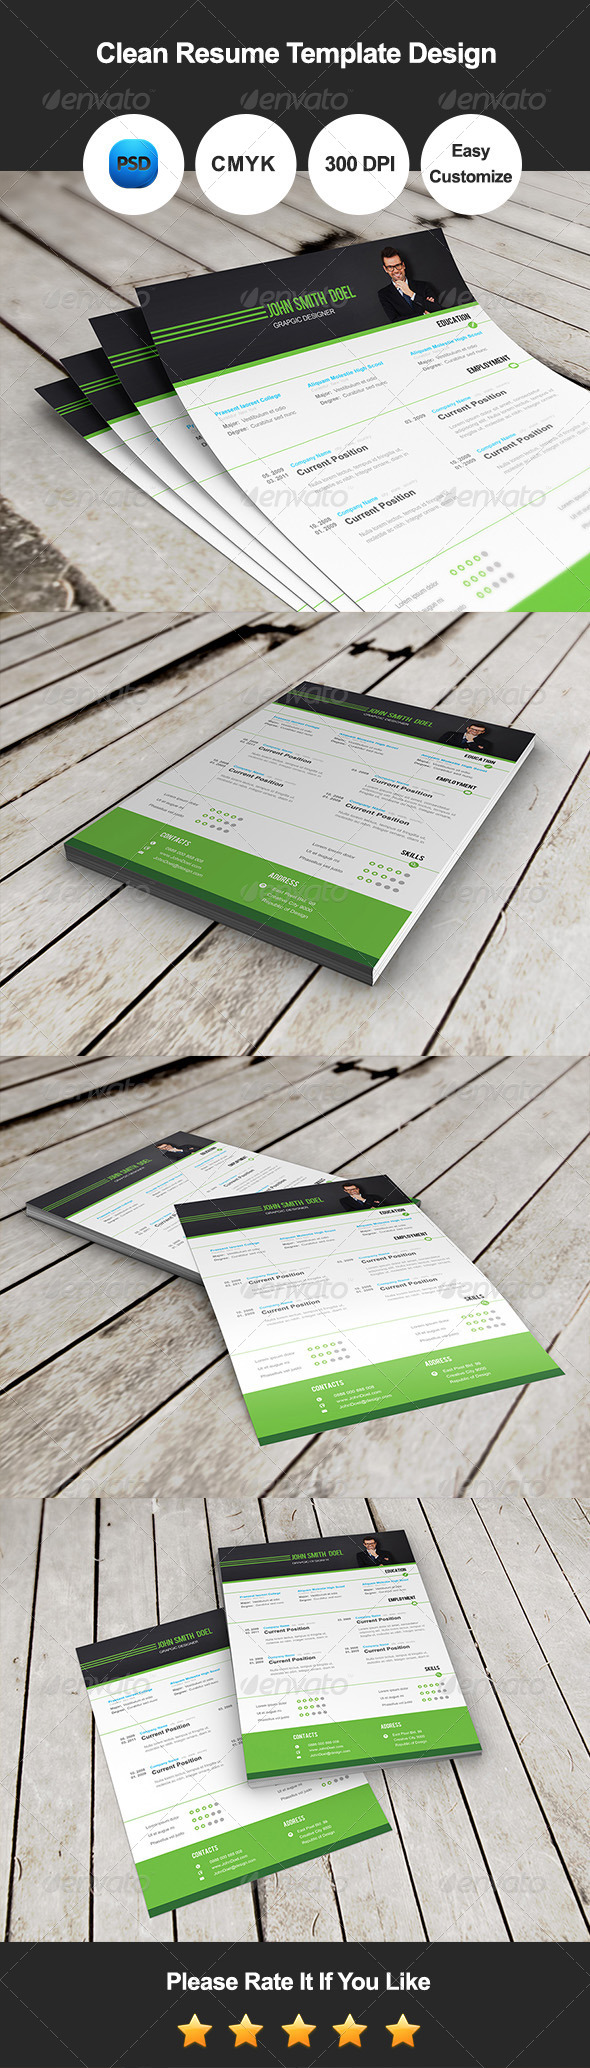 GraphicRiver Clean Resume Template Design 7785167